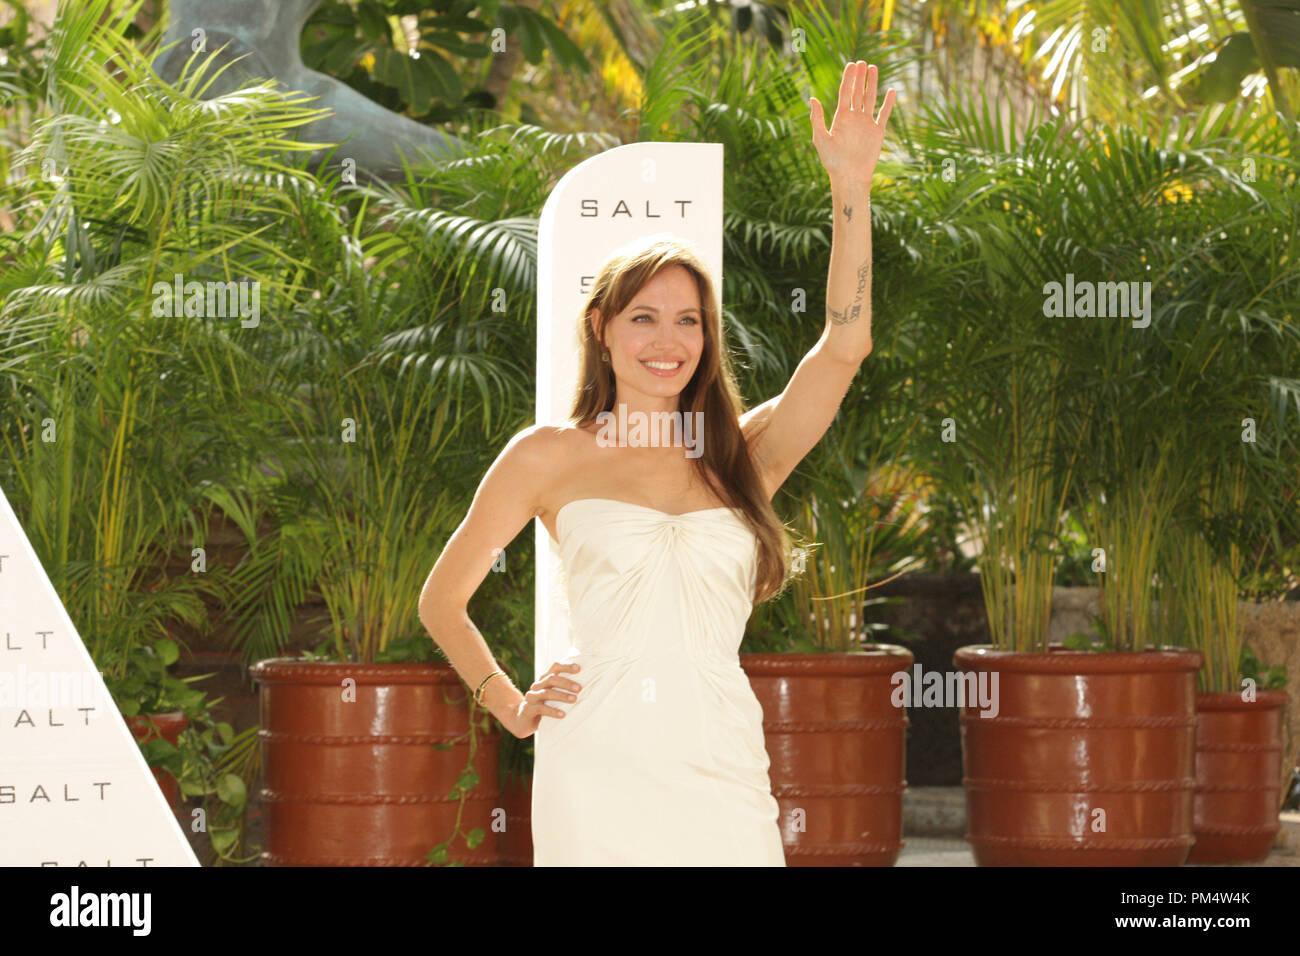 Cancun, Mexiko - 30. Juni 2010: Angelina Jolie an der Columbia Pictures' SALZ Foto bei Sommer Sony statt. Stockbild